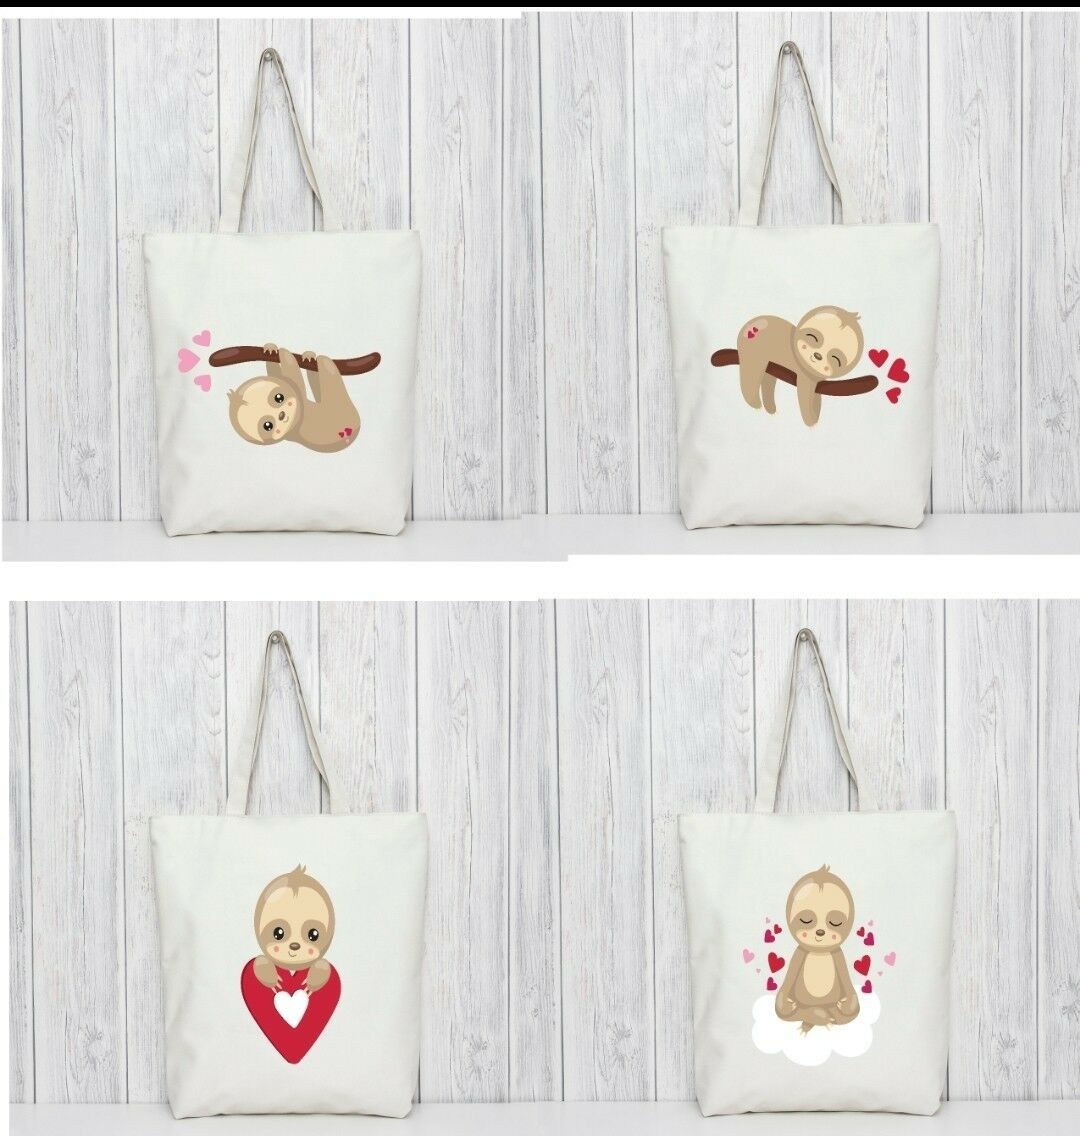 sloth bags